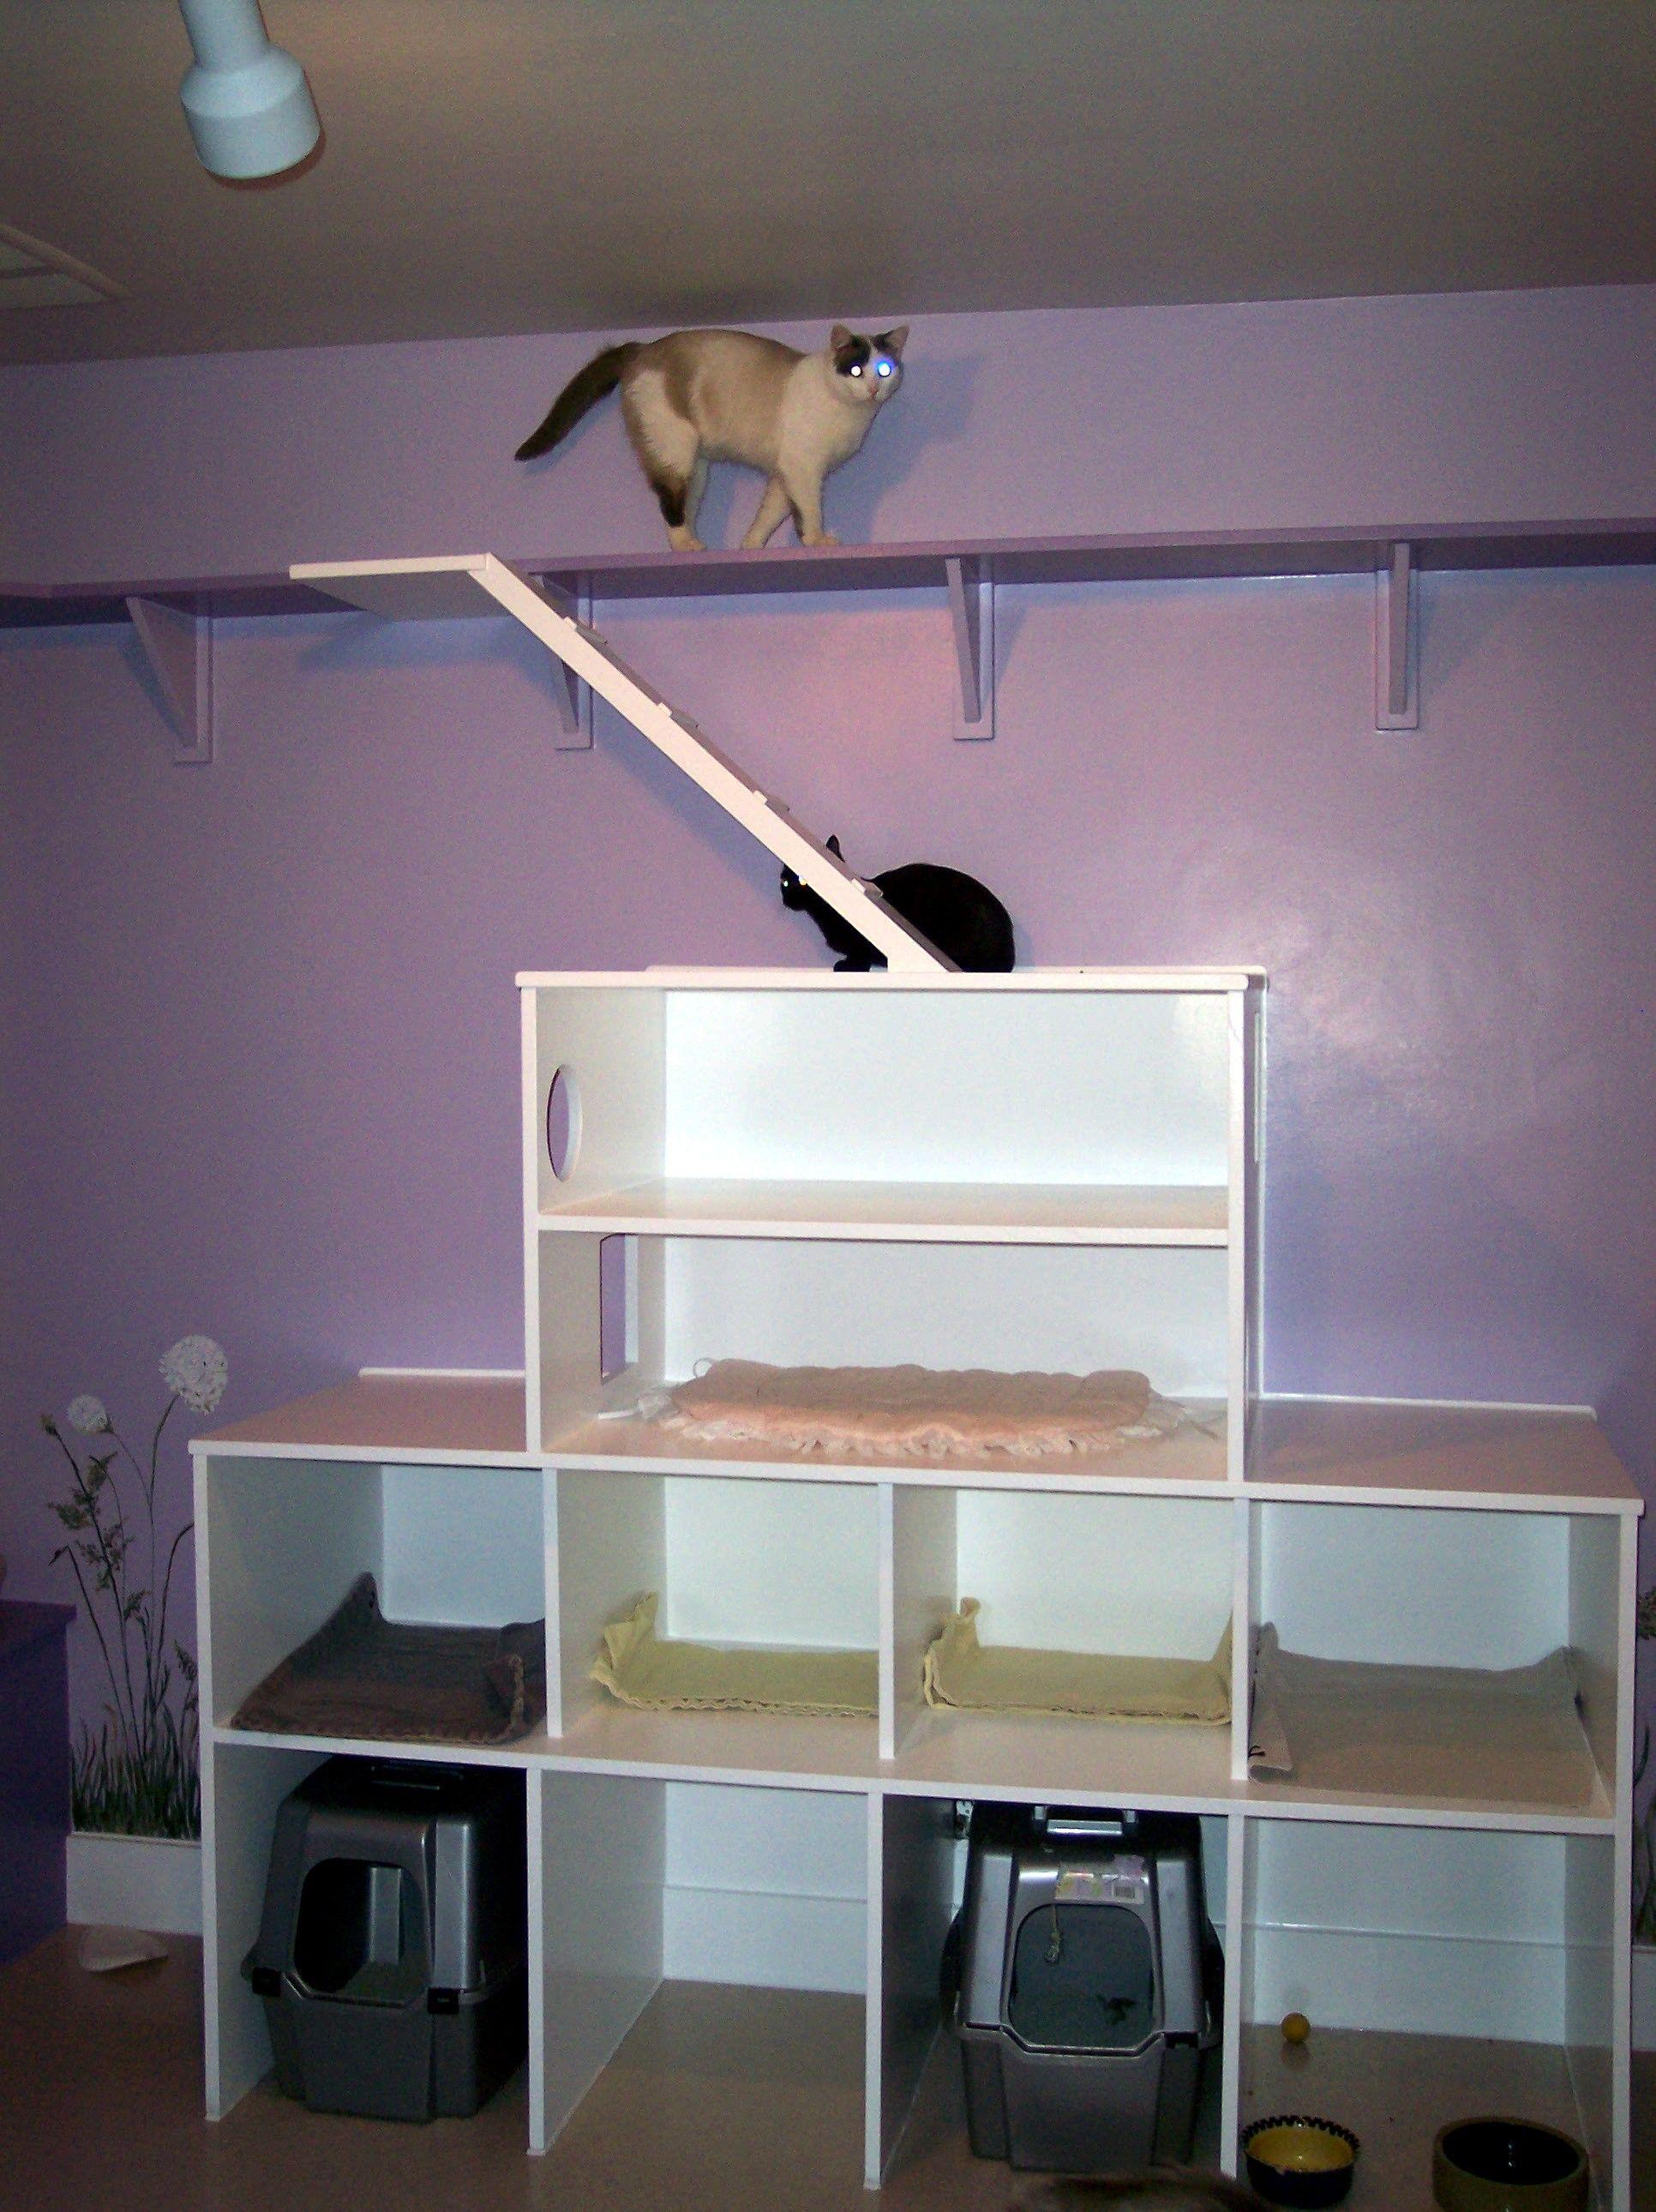 Random cat room idea . Haha my cat would be in heaven